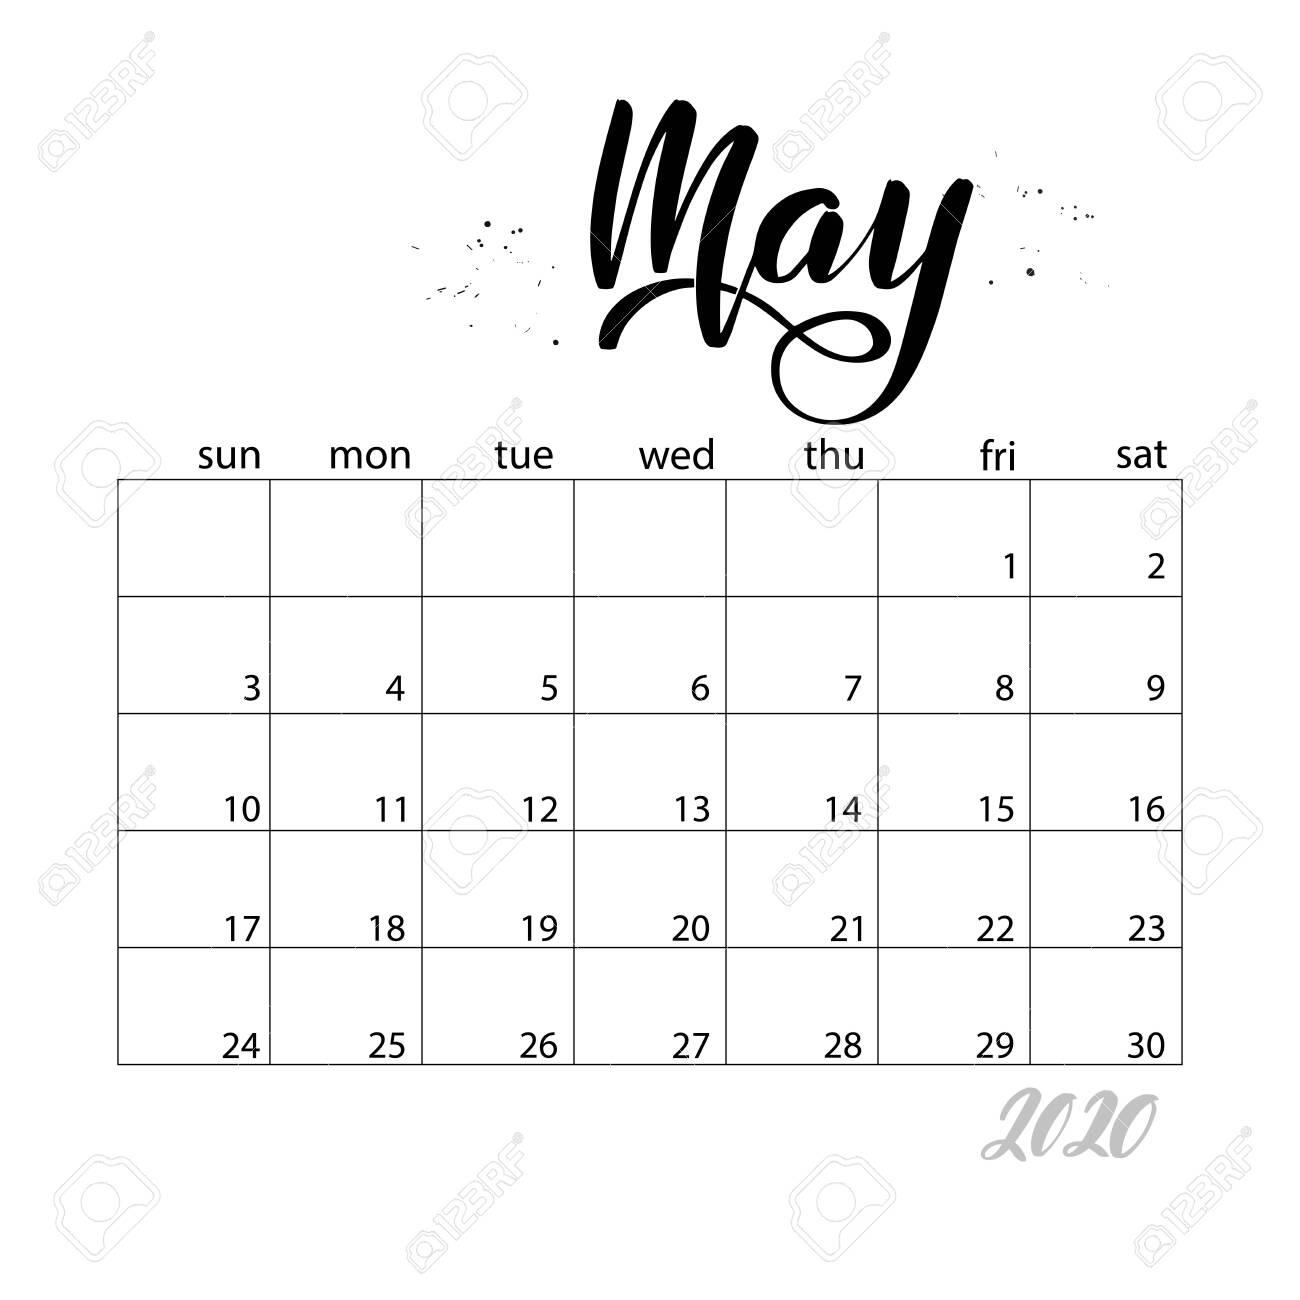 May. Monthly Calendar For 2020 Year. Handwritten Modern Calligraphy..